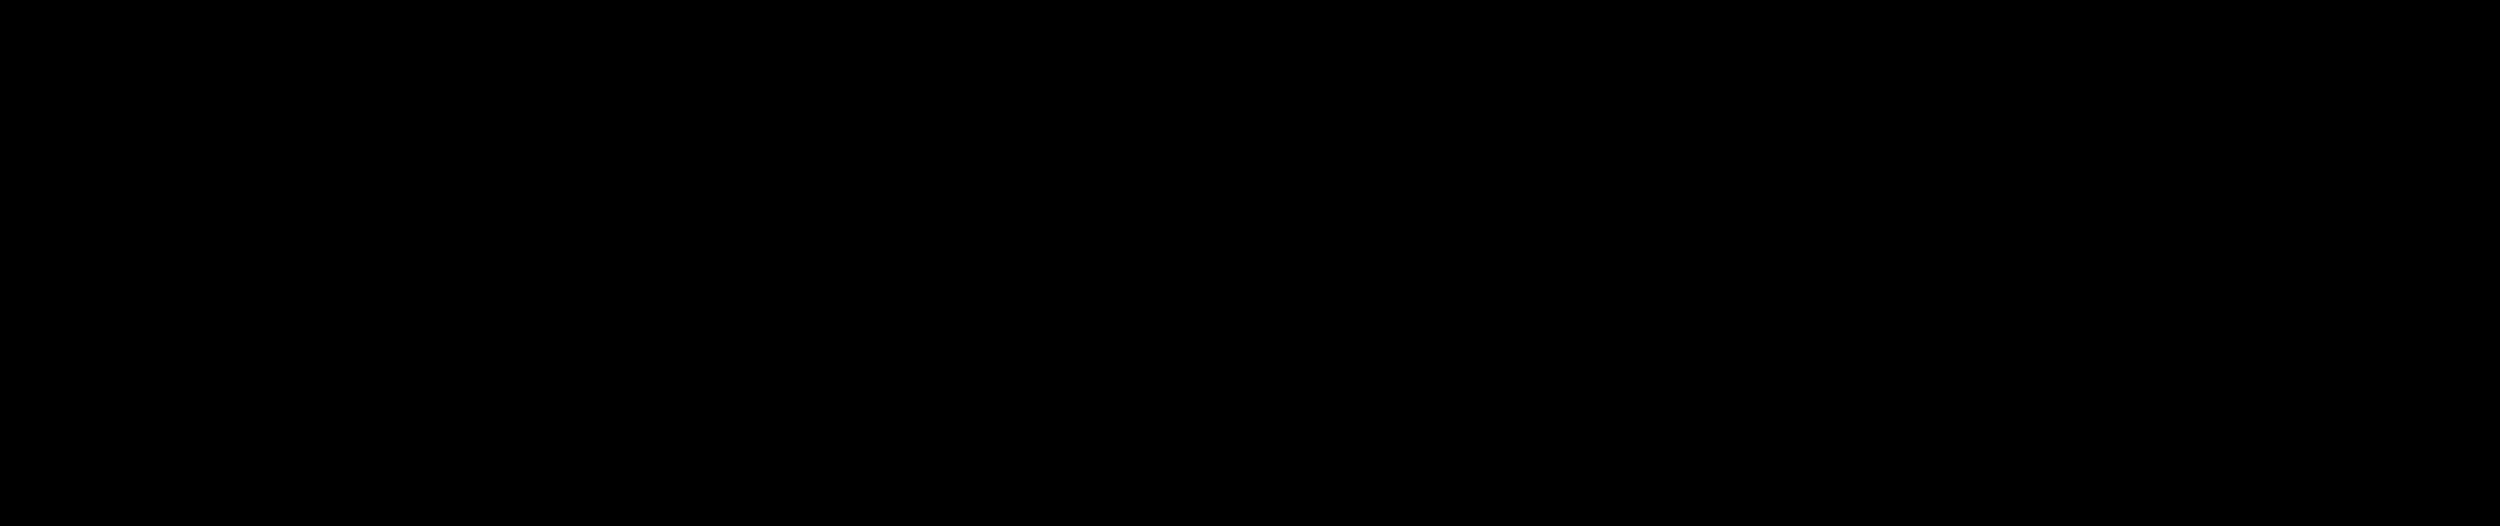 MHF logo black 2015.png